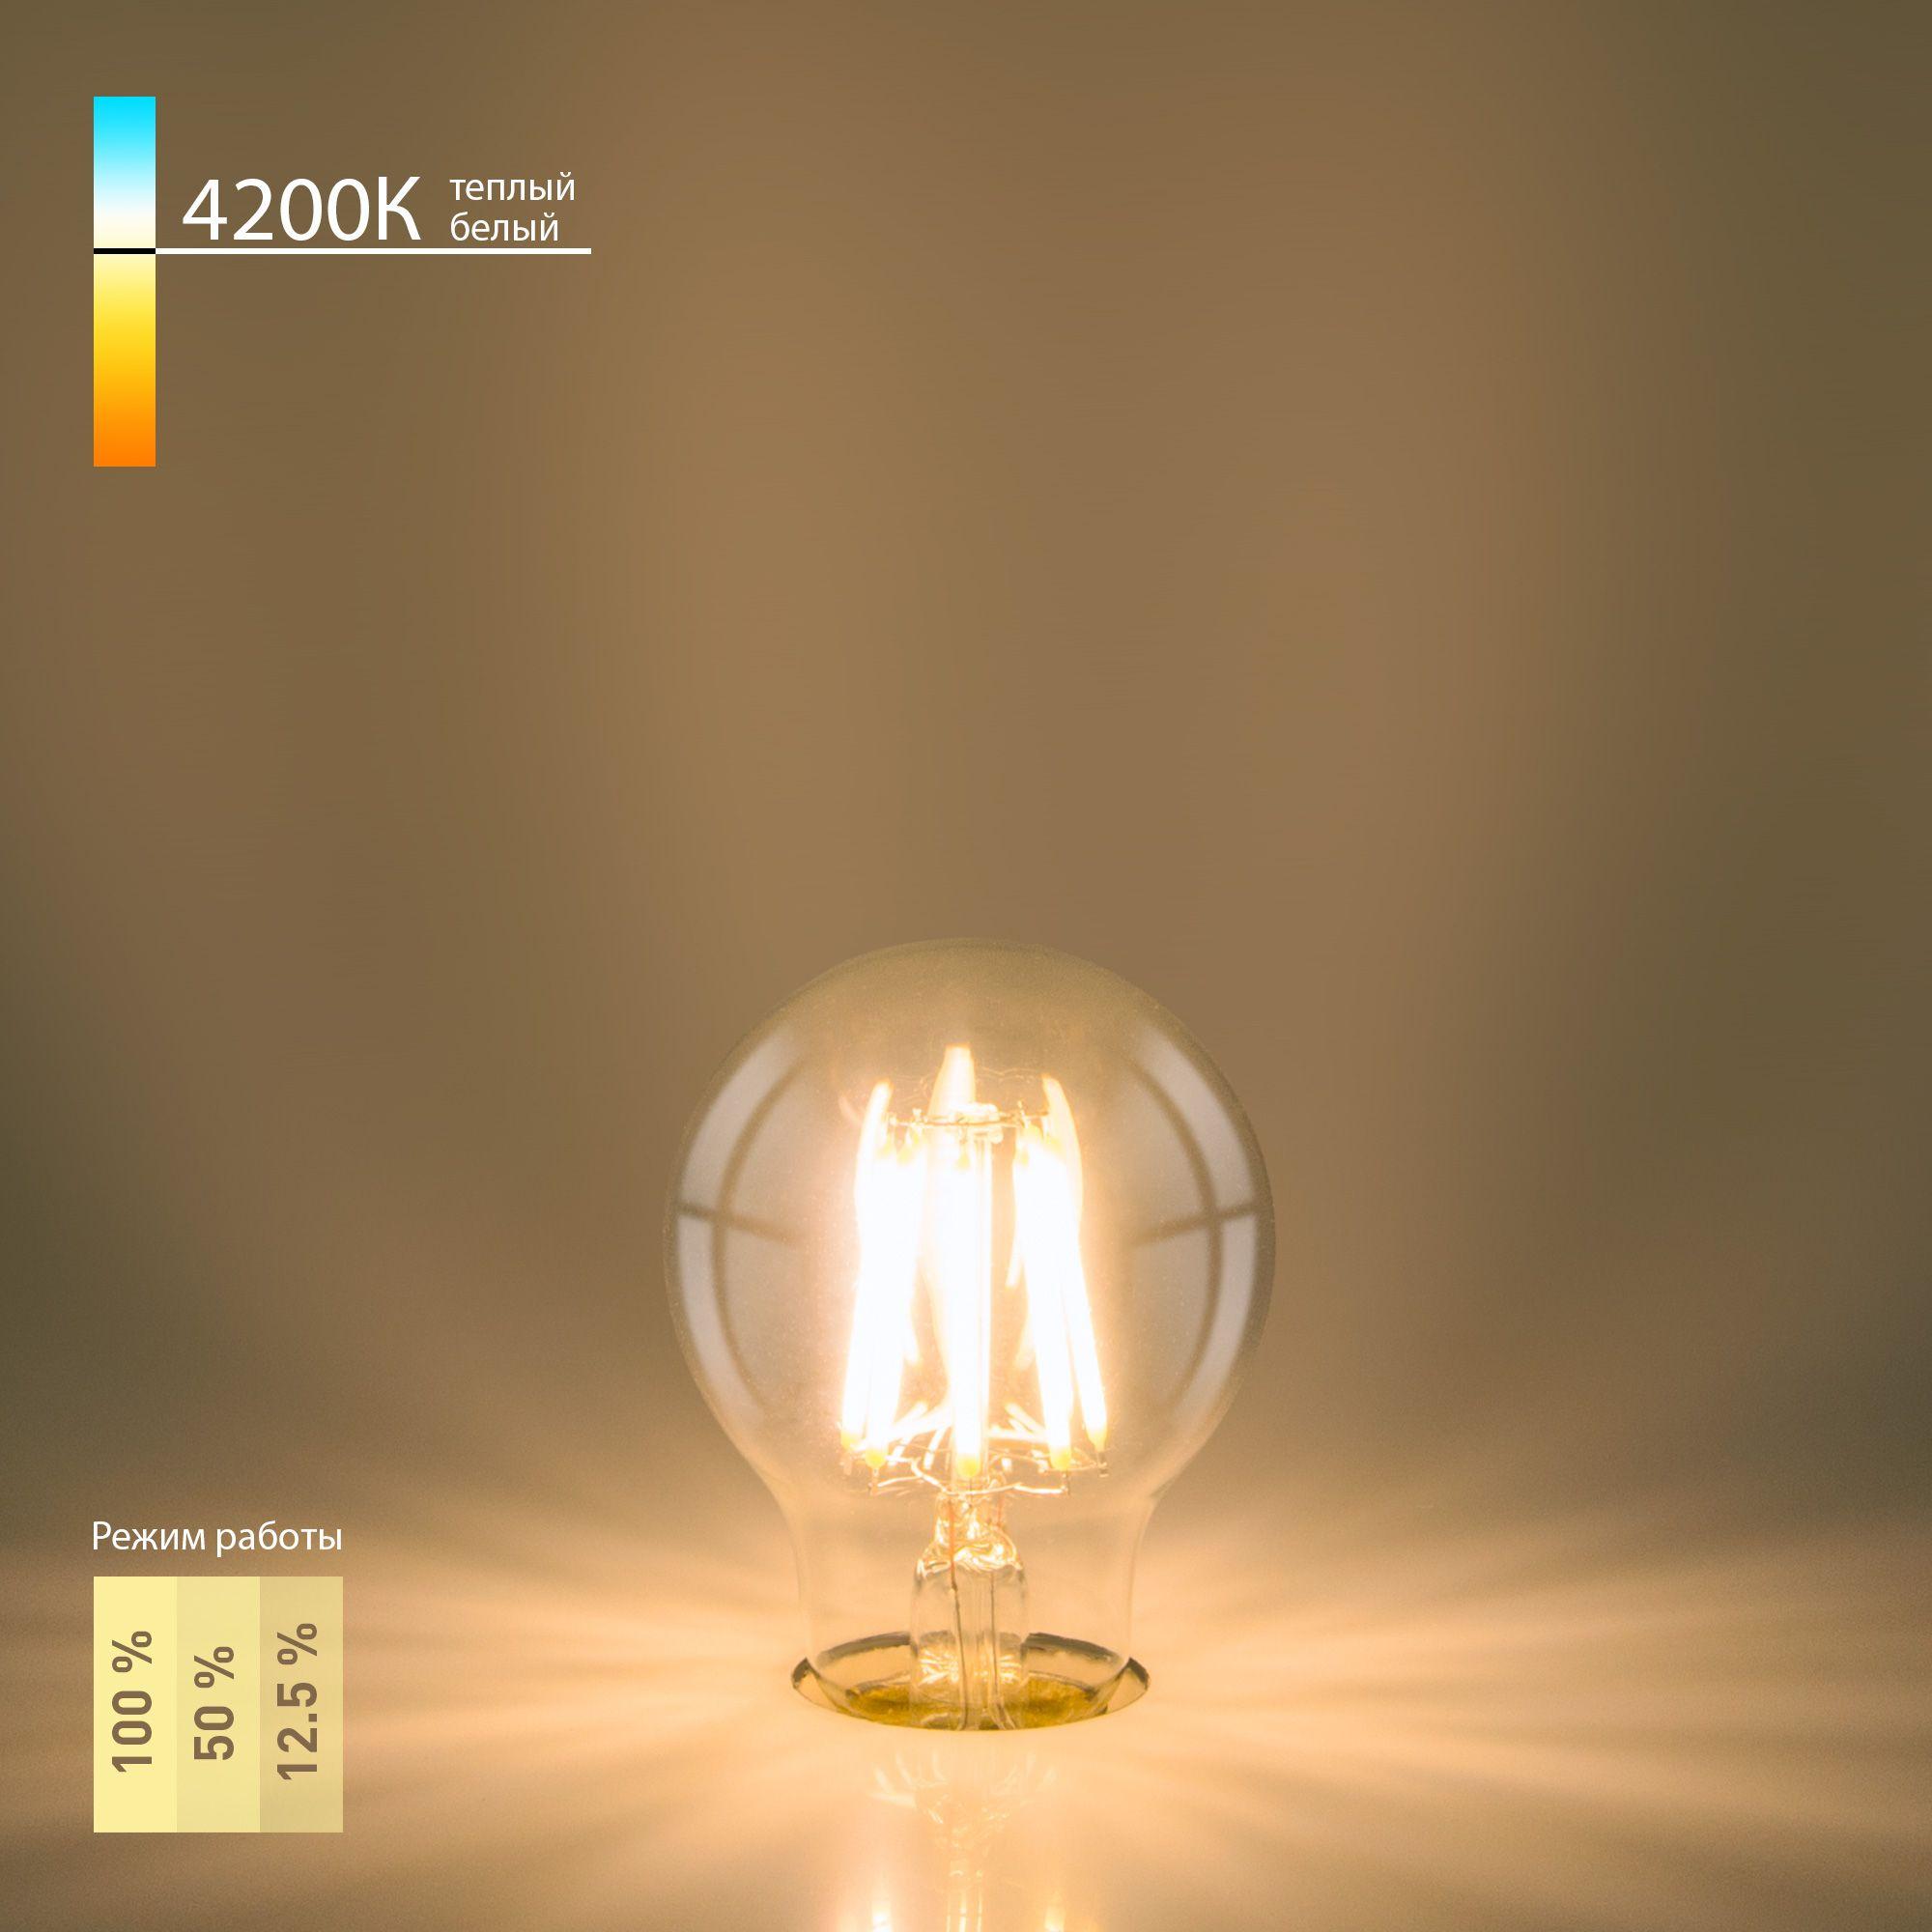 Филаментная светодиодная лампа A60 Dimmable 9W 4200K E27 BL133